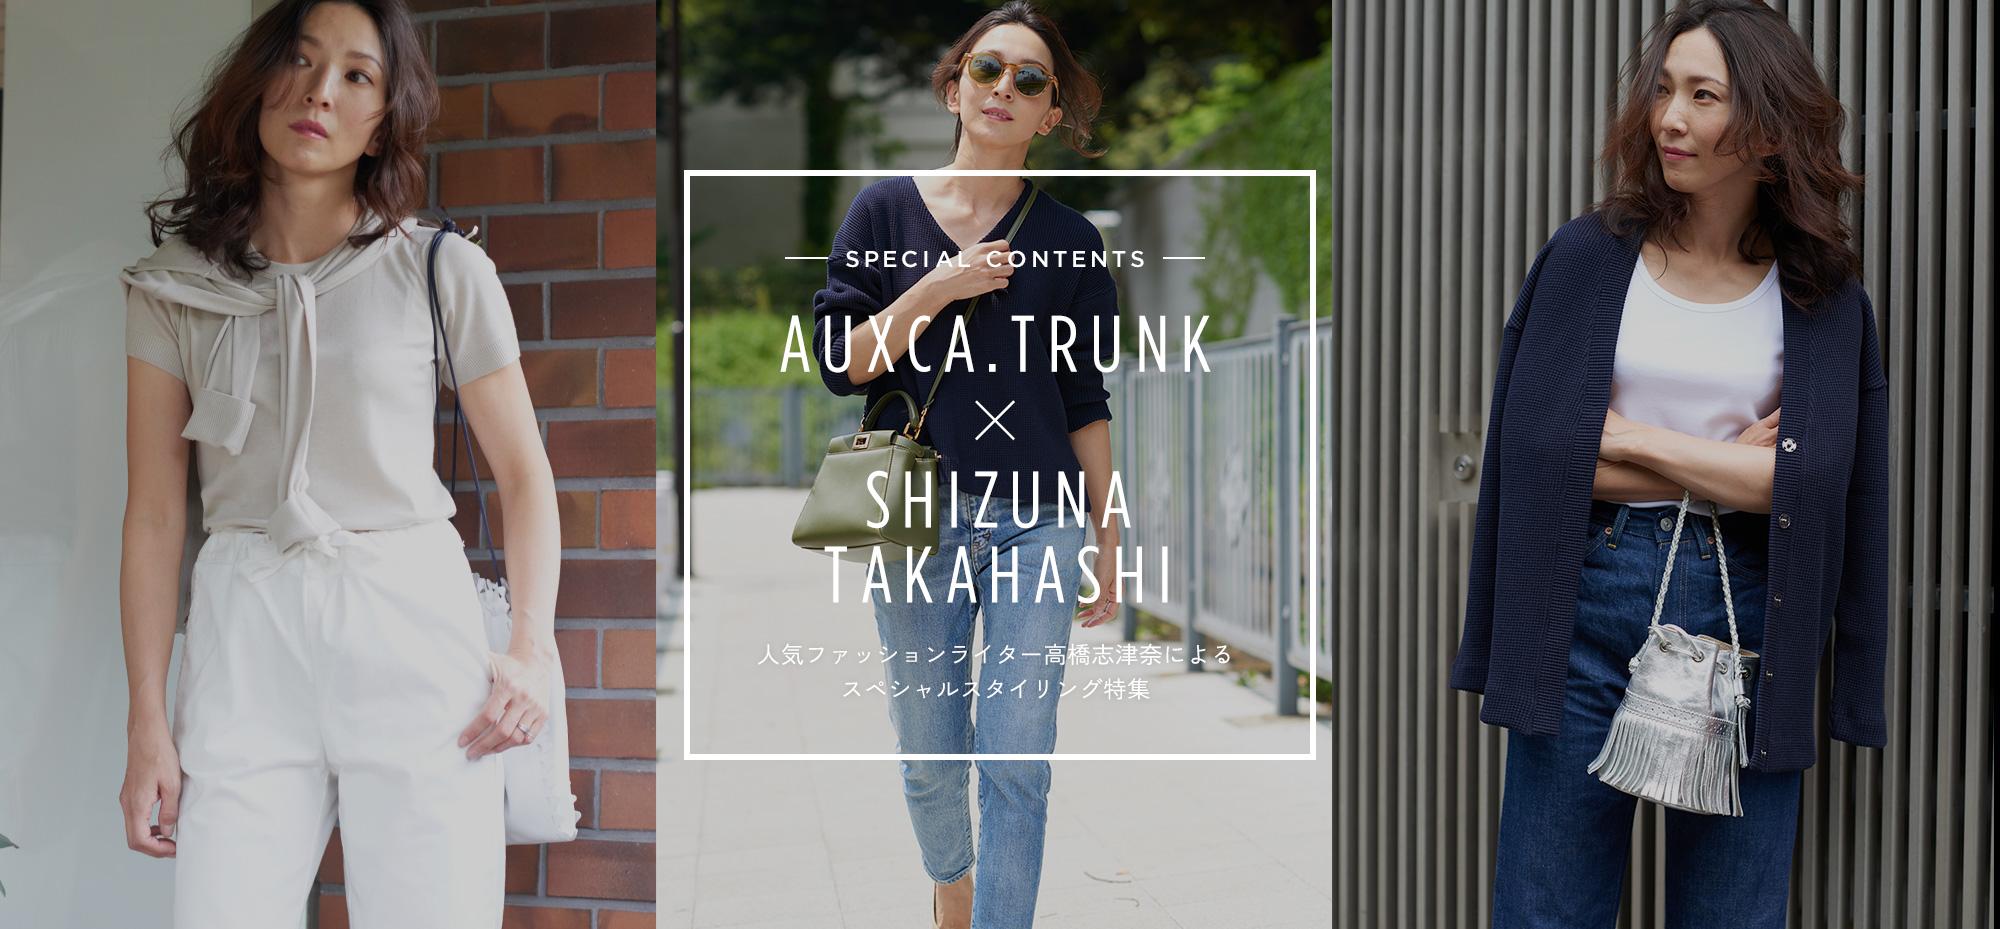 SPECIAL CONTENTS AUXCA.TRUNK SHIZUNA TAKAHASHI 人気ファッションライター高橋志津奈によるスペシャルスタイリング特集